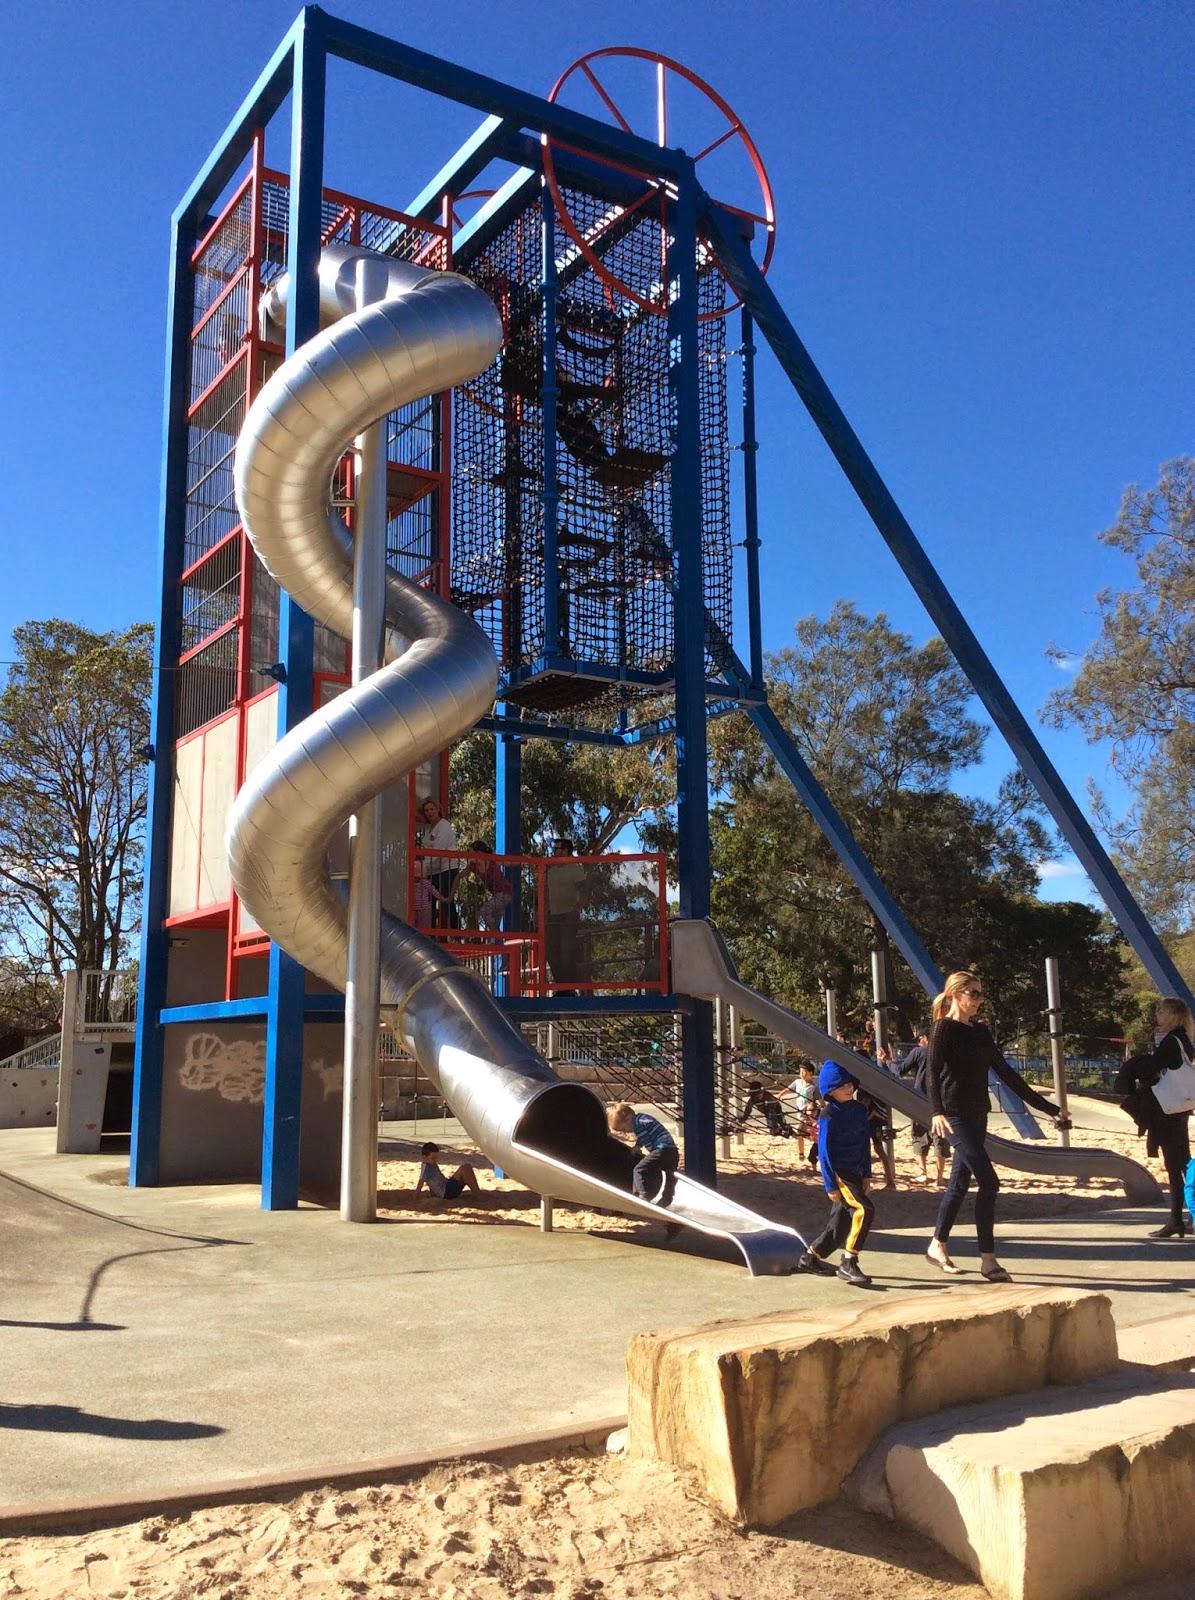 Kieran And Sean's Australian Adventure May '14: Really